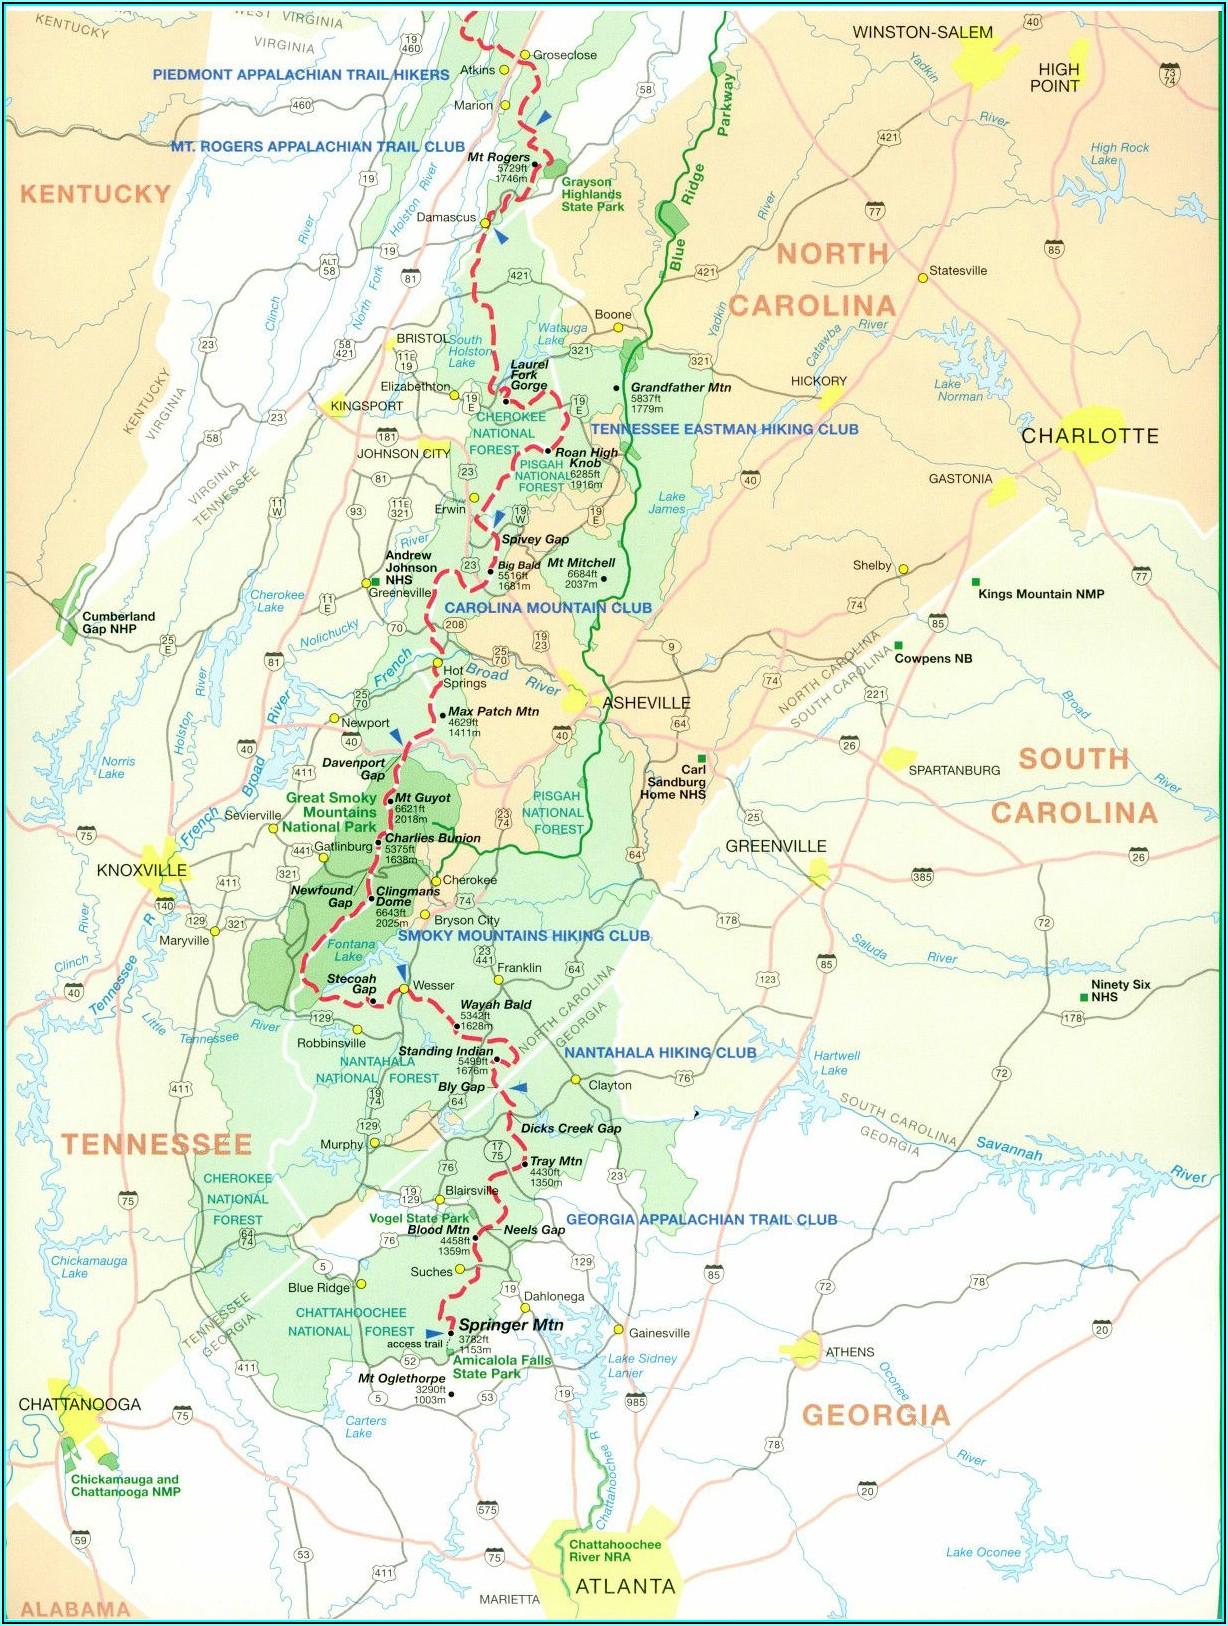 Detailed Appalachian Trail Map